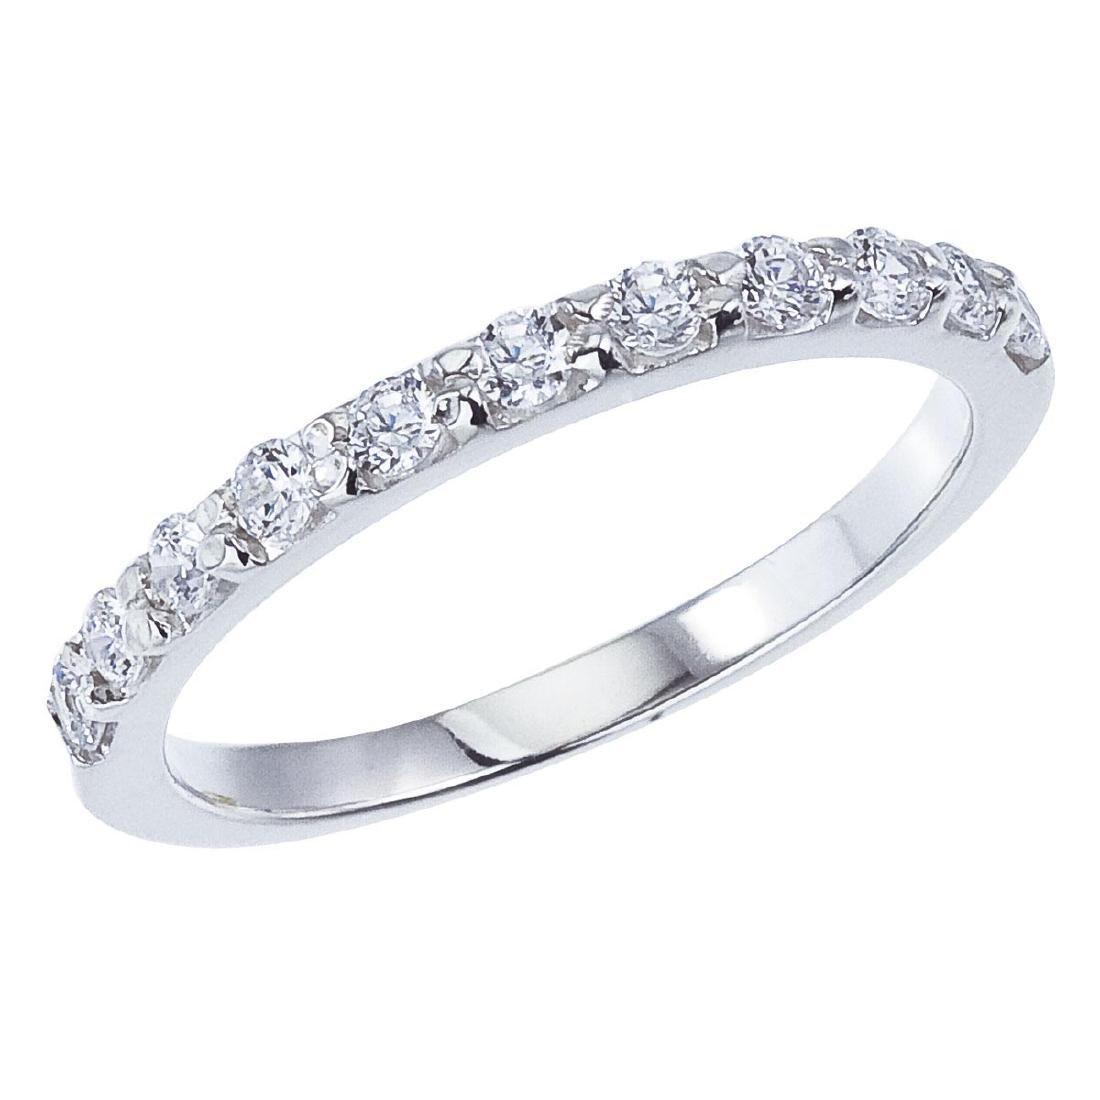 Certified 14K White Gold .55 CTW Diamond Band Ring 0.55